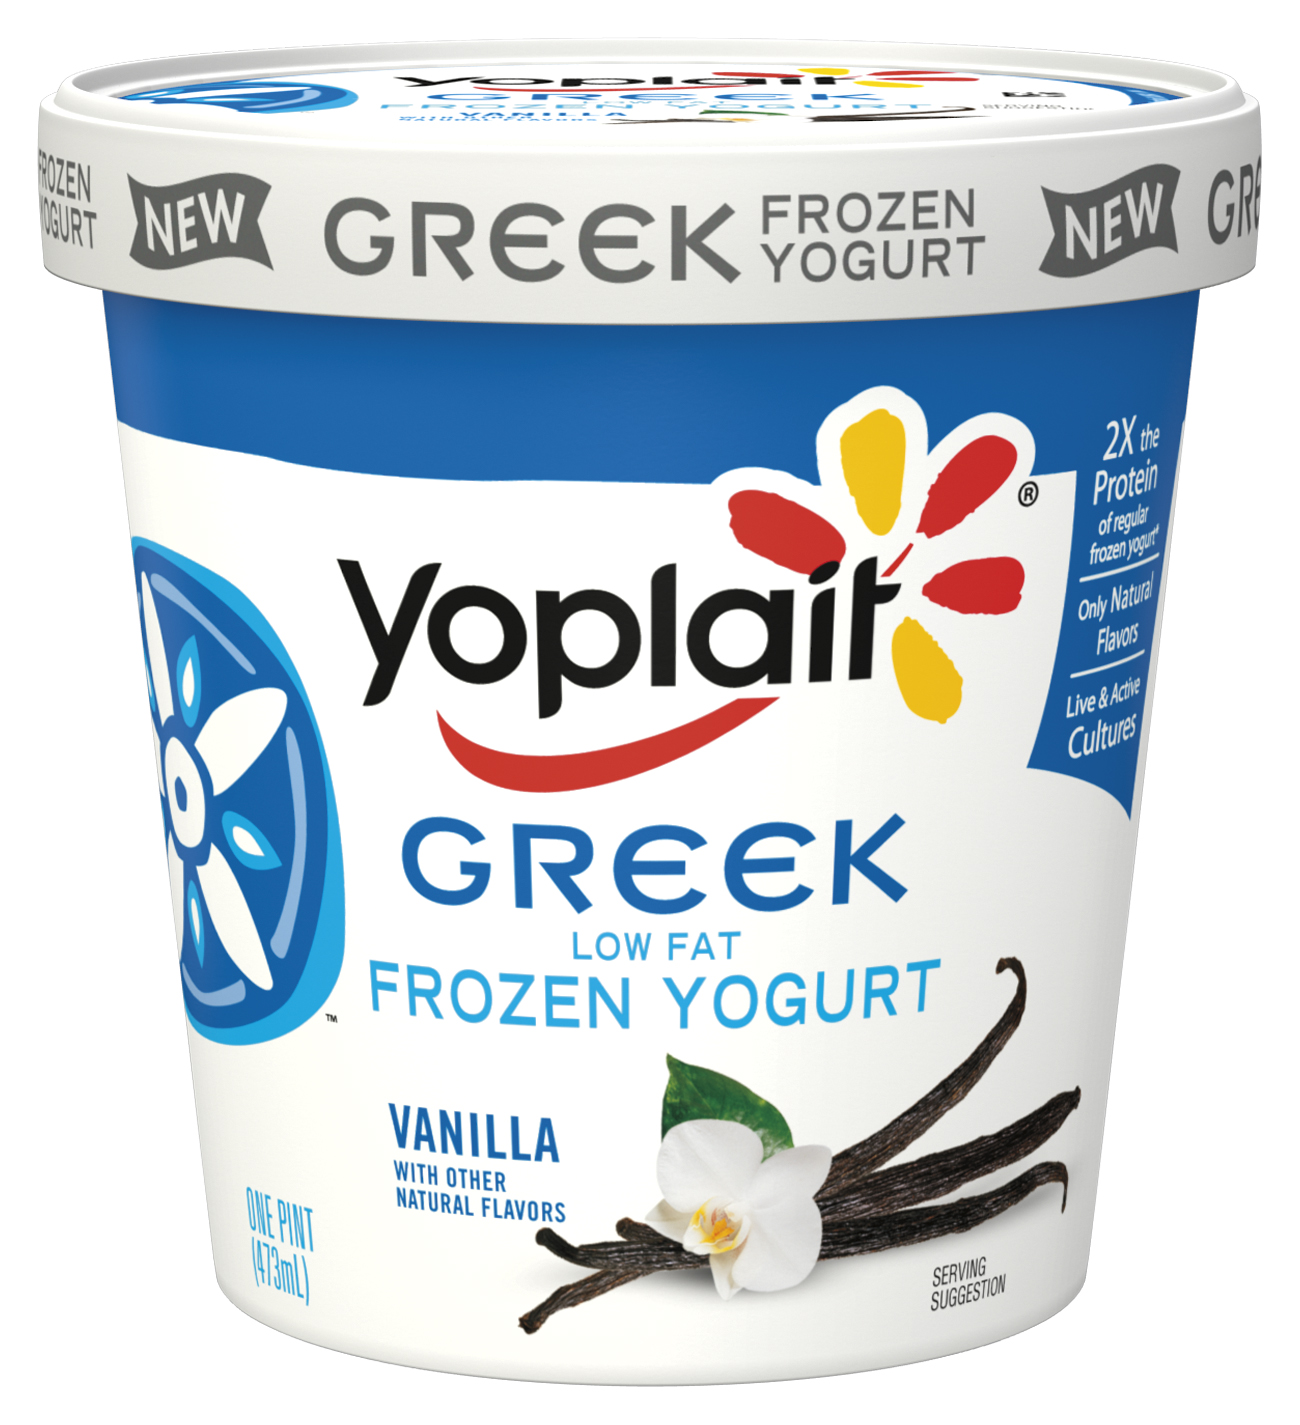 My Favorite Things...: Yoplait Frozen Yogurt Gift Pack ...